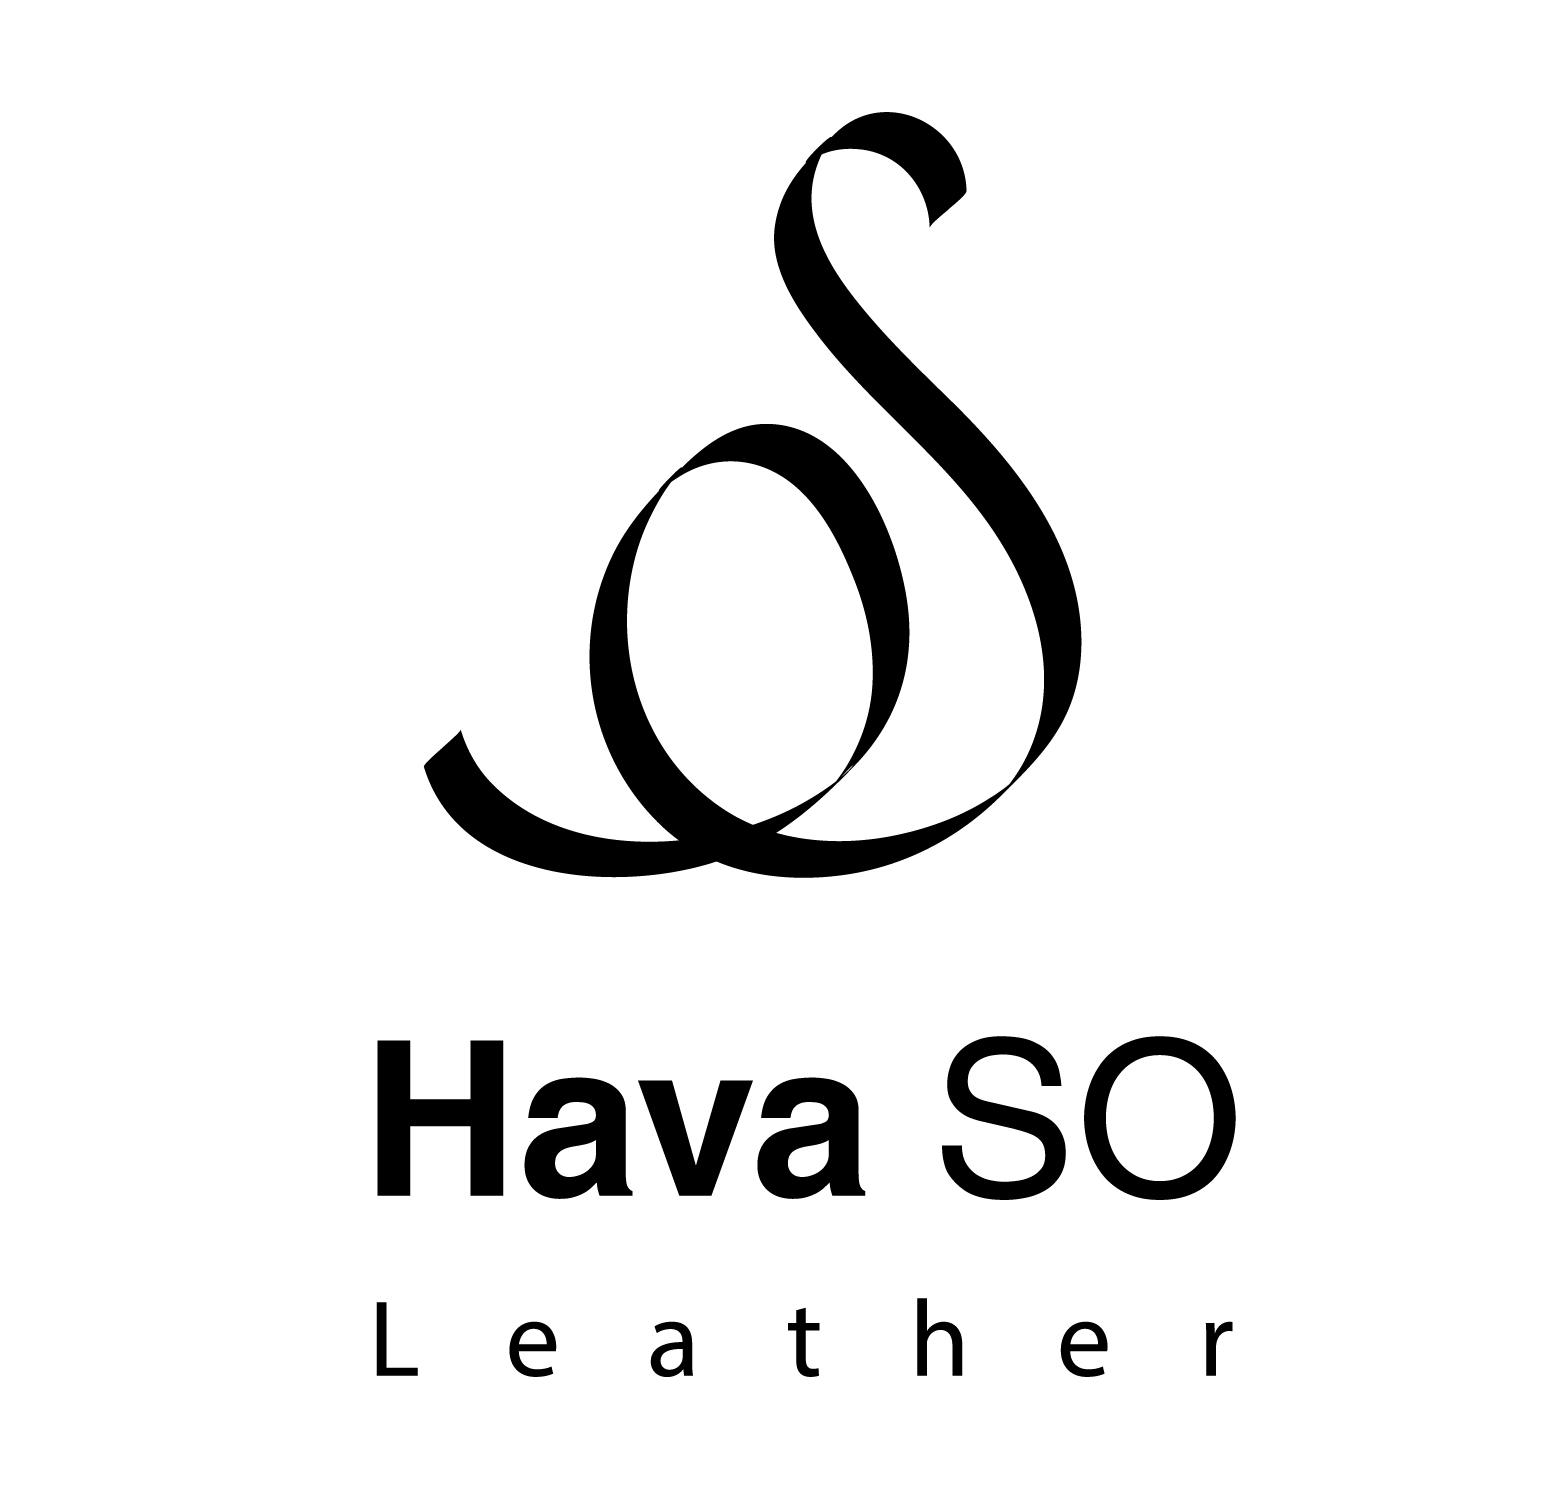 logo Hava OS-web-02